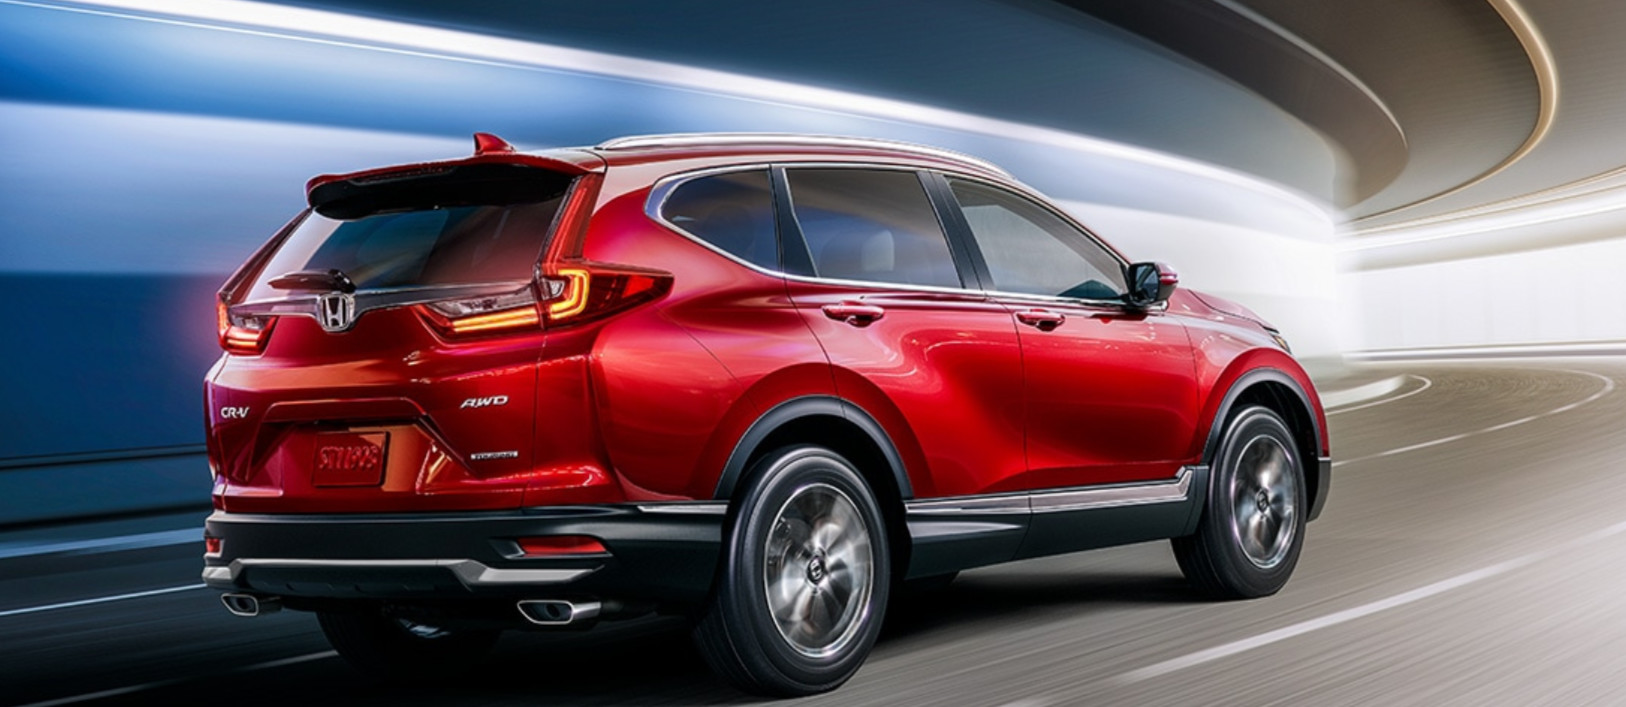 2020 Honda CR-V Leasing near Spring, TX